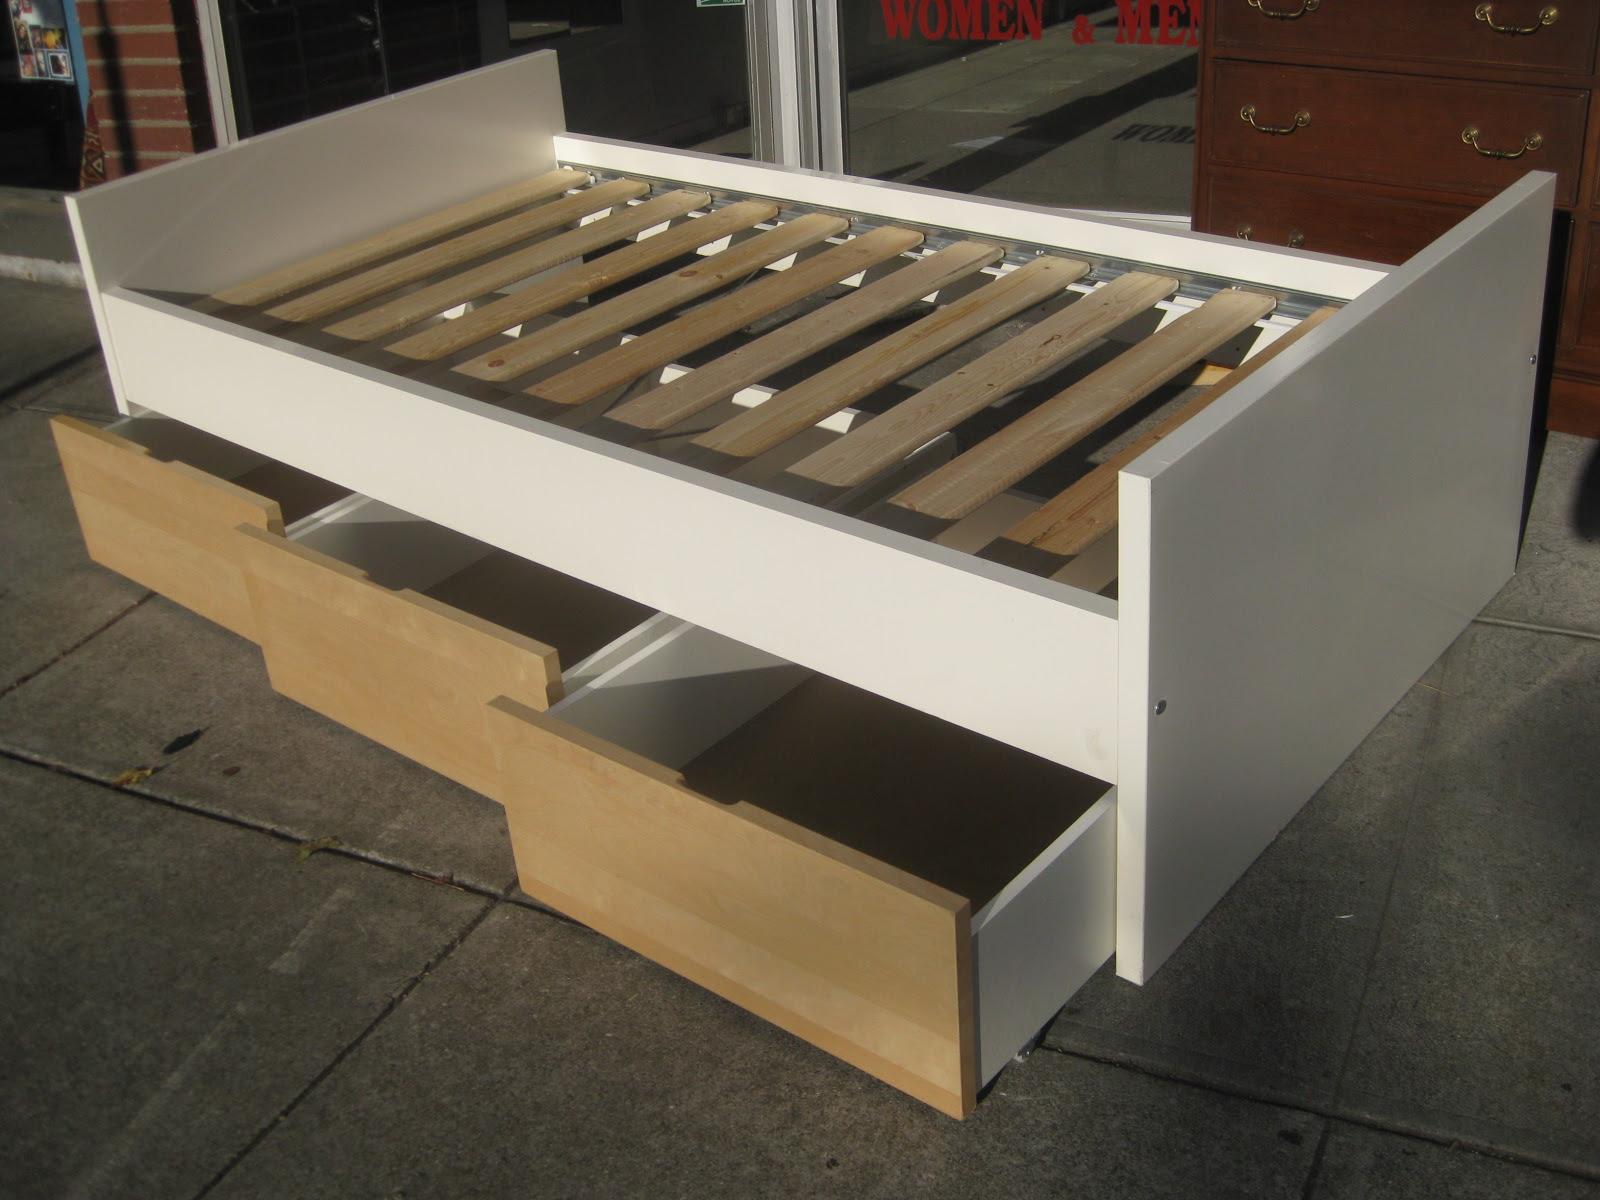 King Size Platform Bed Drawers Plans Aquaponics Build